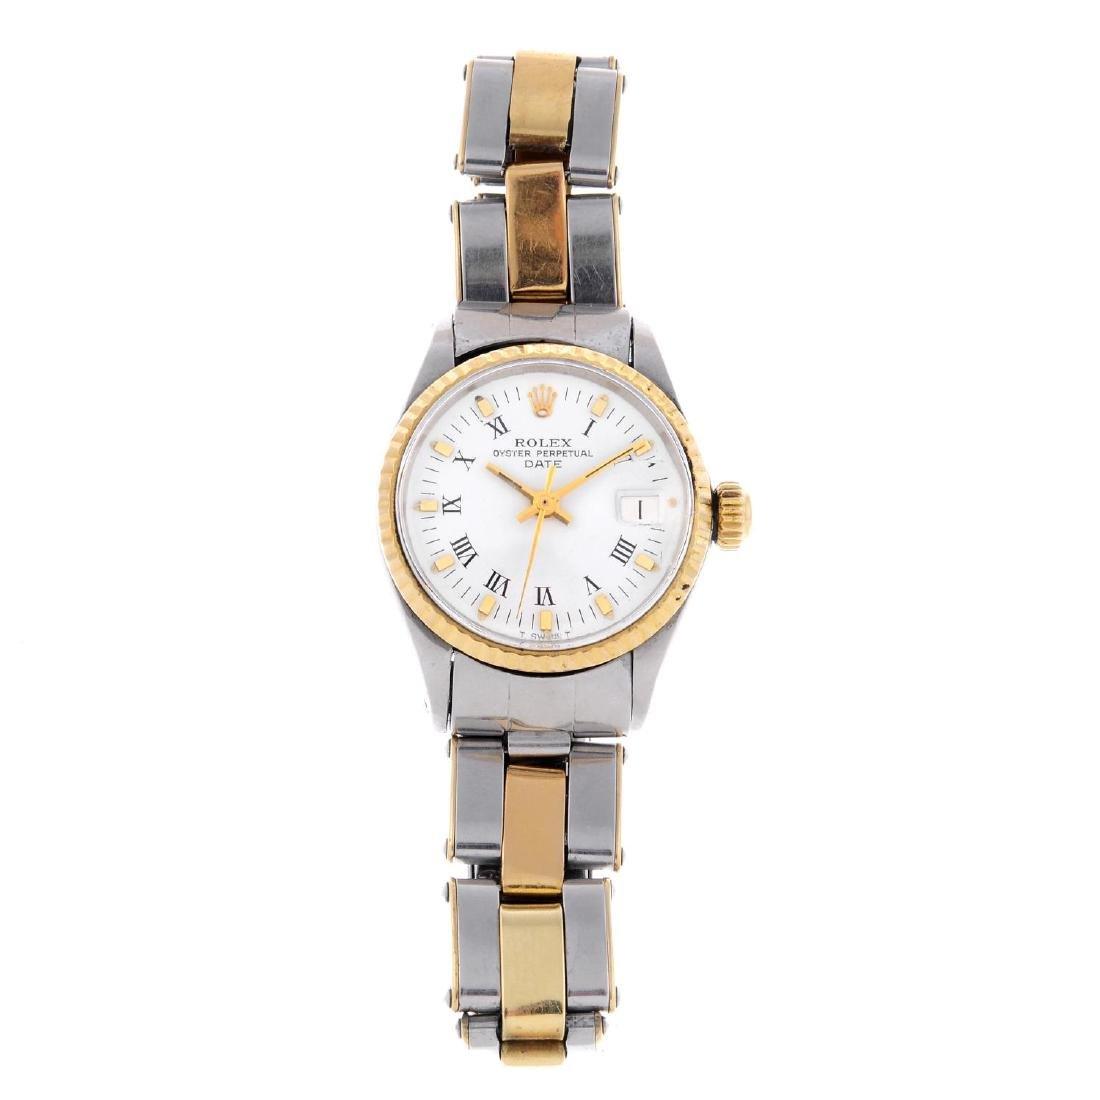 ROLEX - a lady's Oyster Perpetual Date bracelet watch.